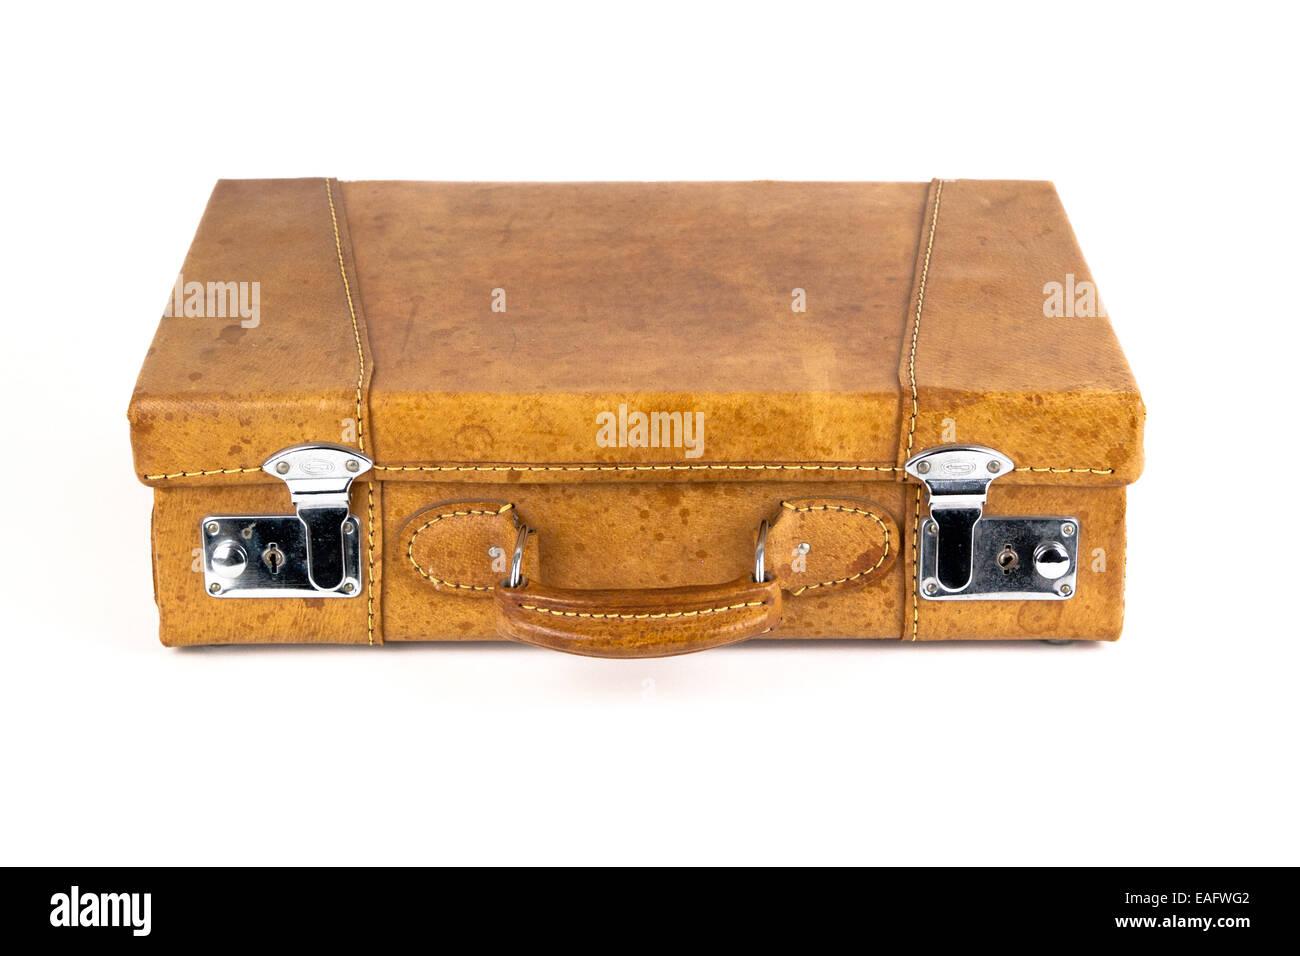 alter koffer stock photos alter koffer stock images alamy. Black Bedroom Furniture Sets. Home Design Ideas